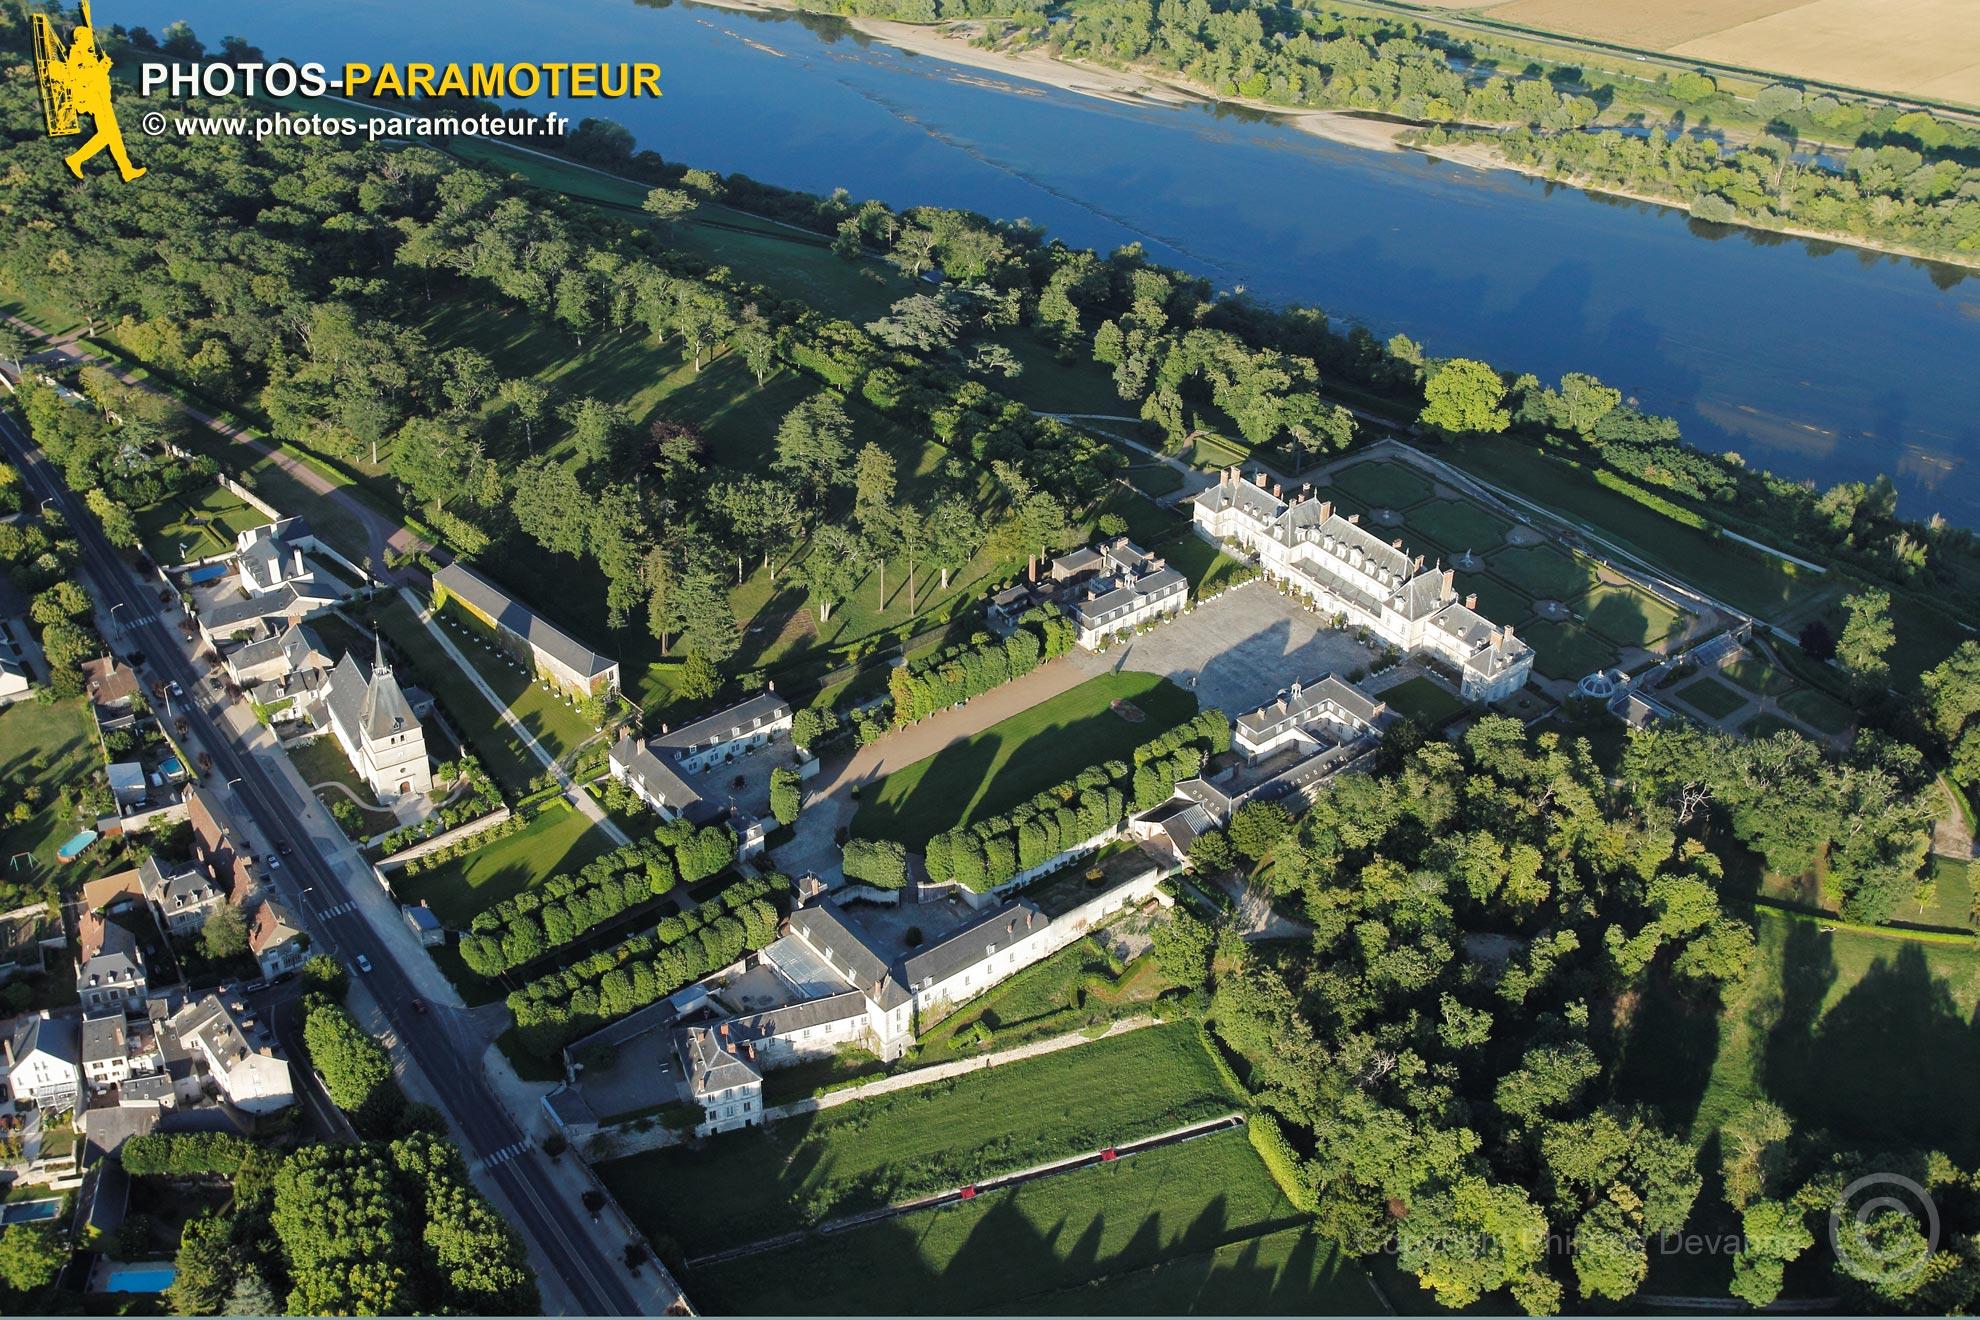 Ménars, France - 25 Juin 2011: château de Ménars vu du ciel